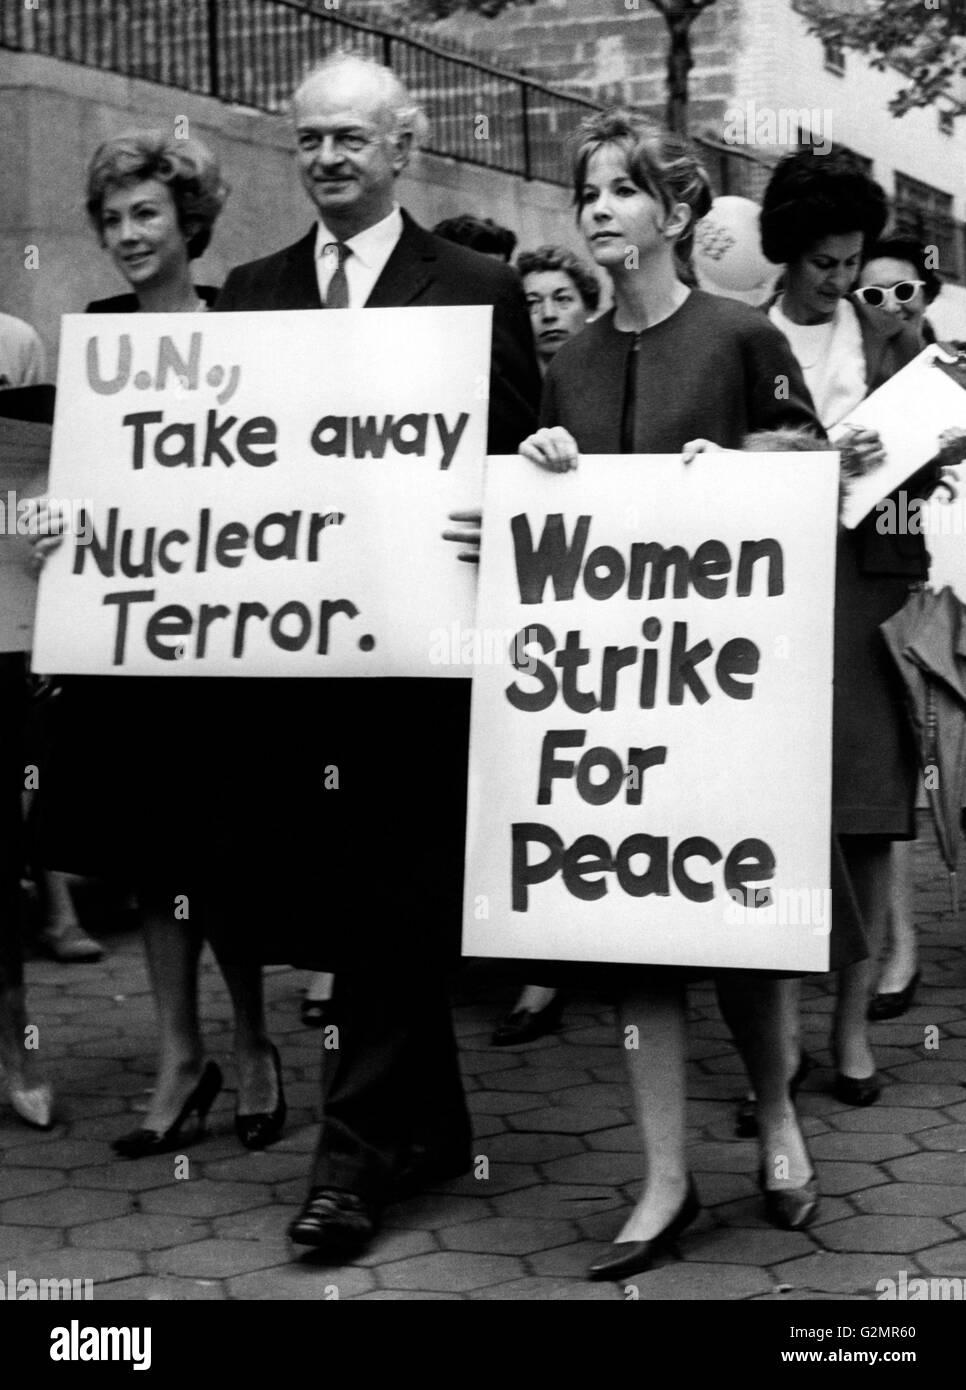 New York, den Nobelpreis für Physik Linus Pauling während einer Friedensdemonstration, 1966 Stockbild